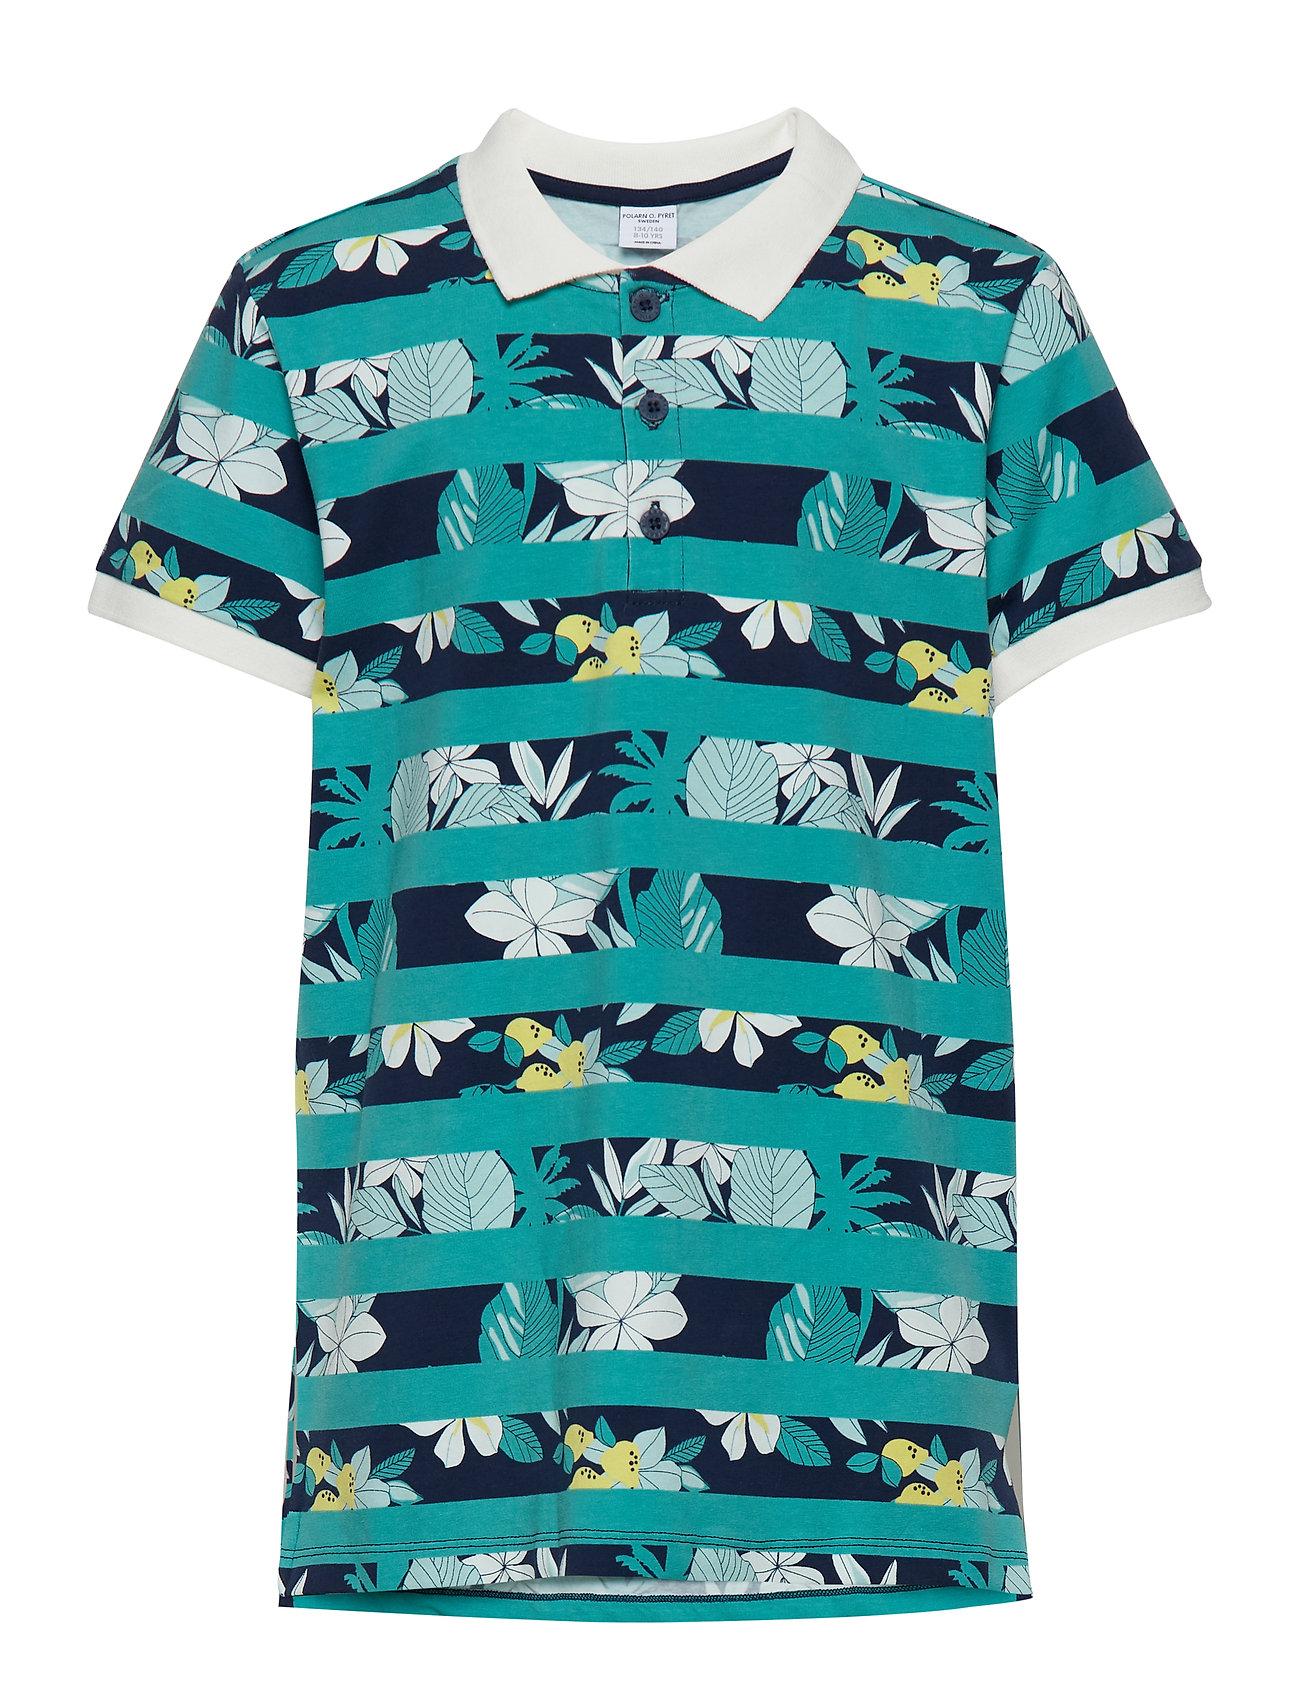 Polarn O. Pyret T-shirt S/S Piké School